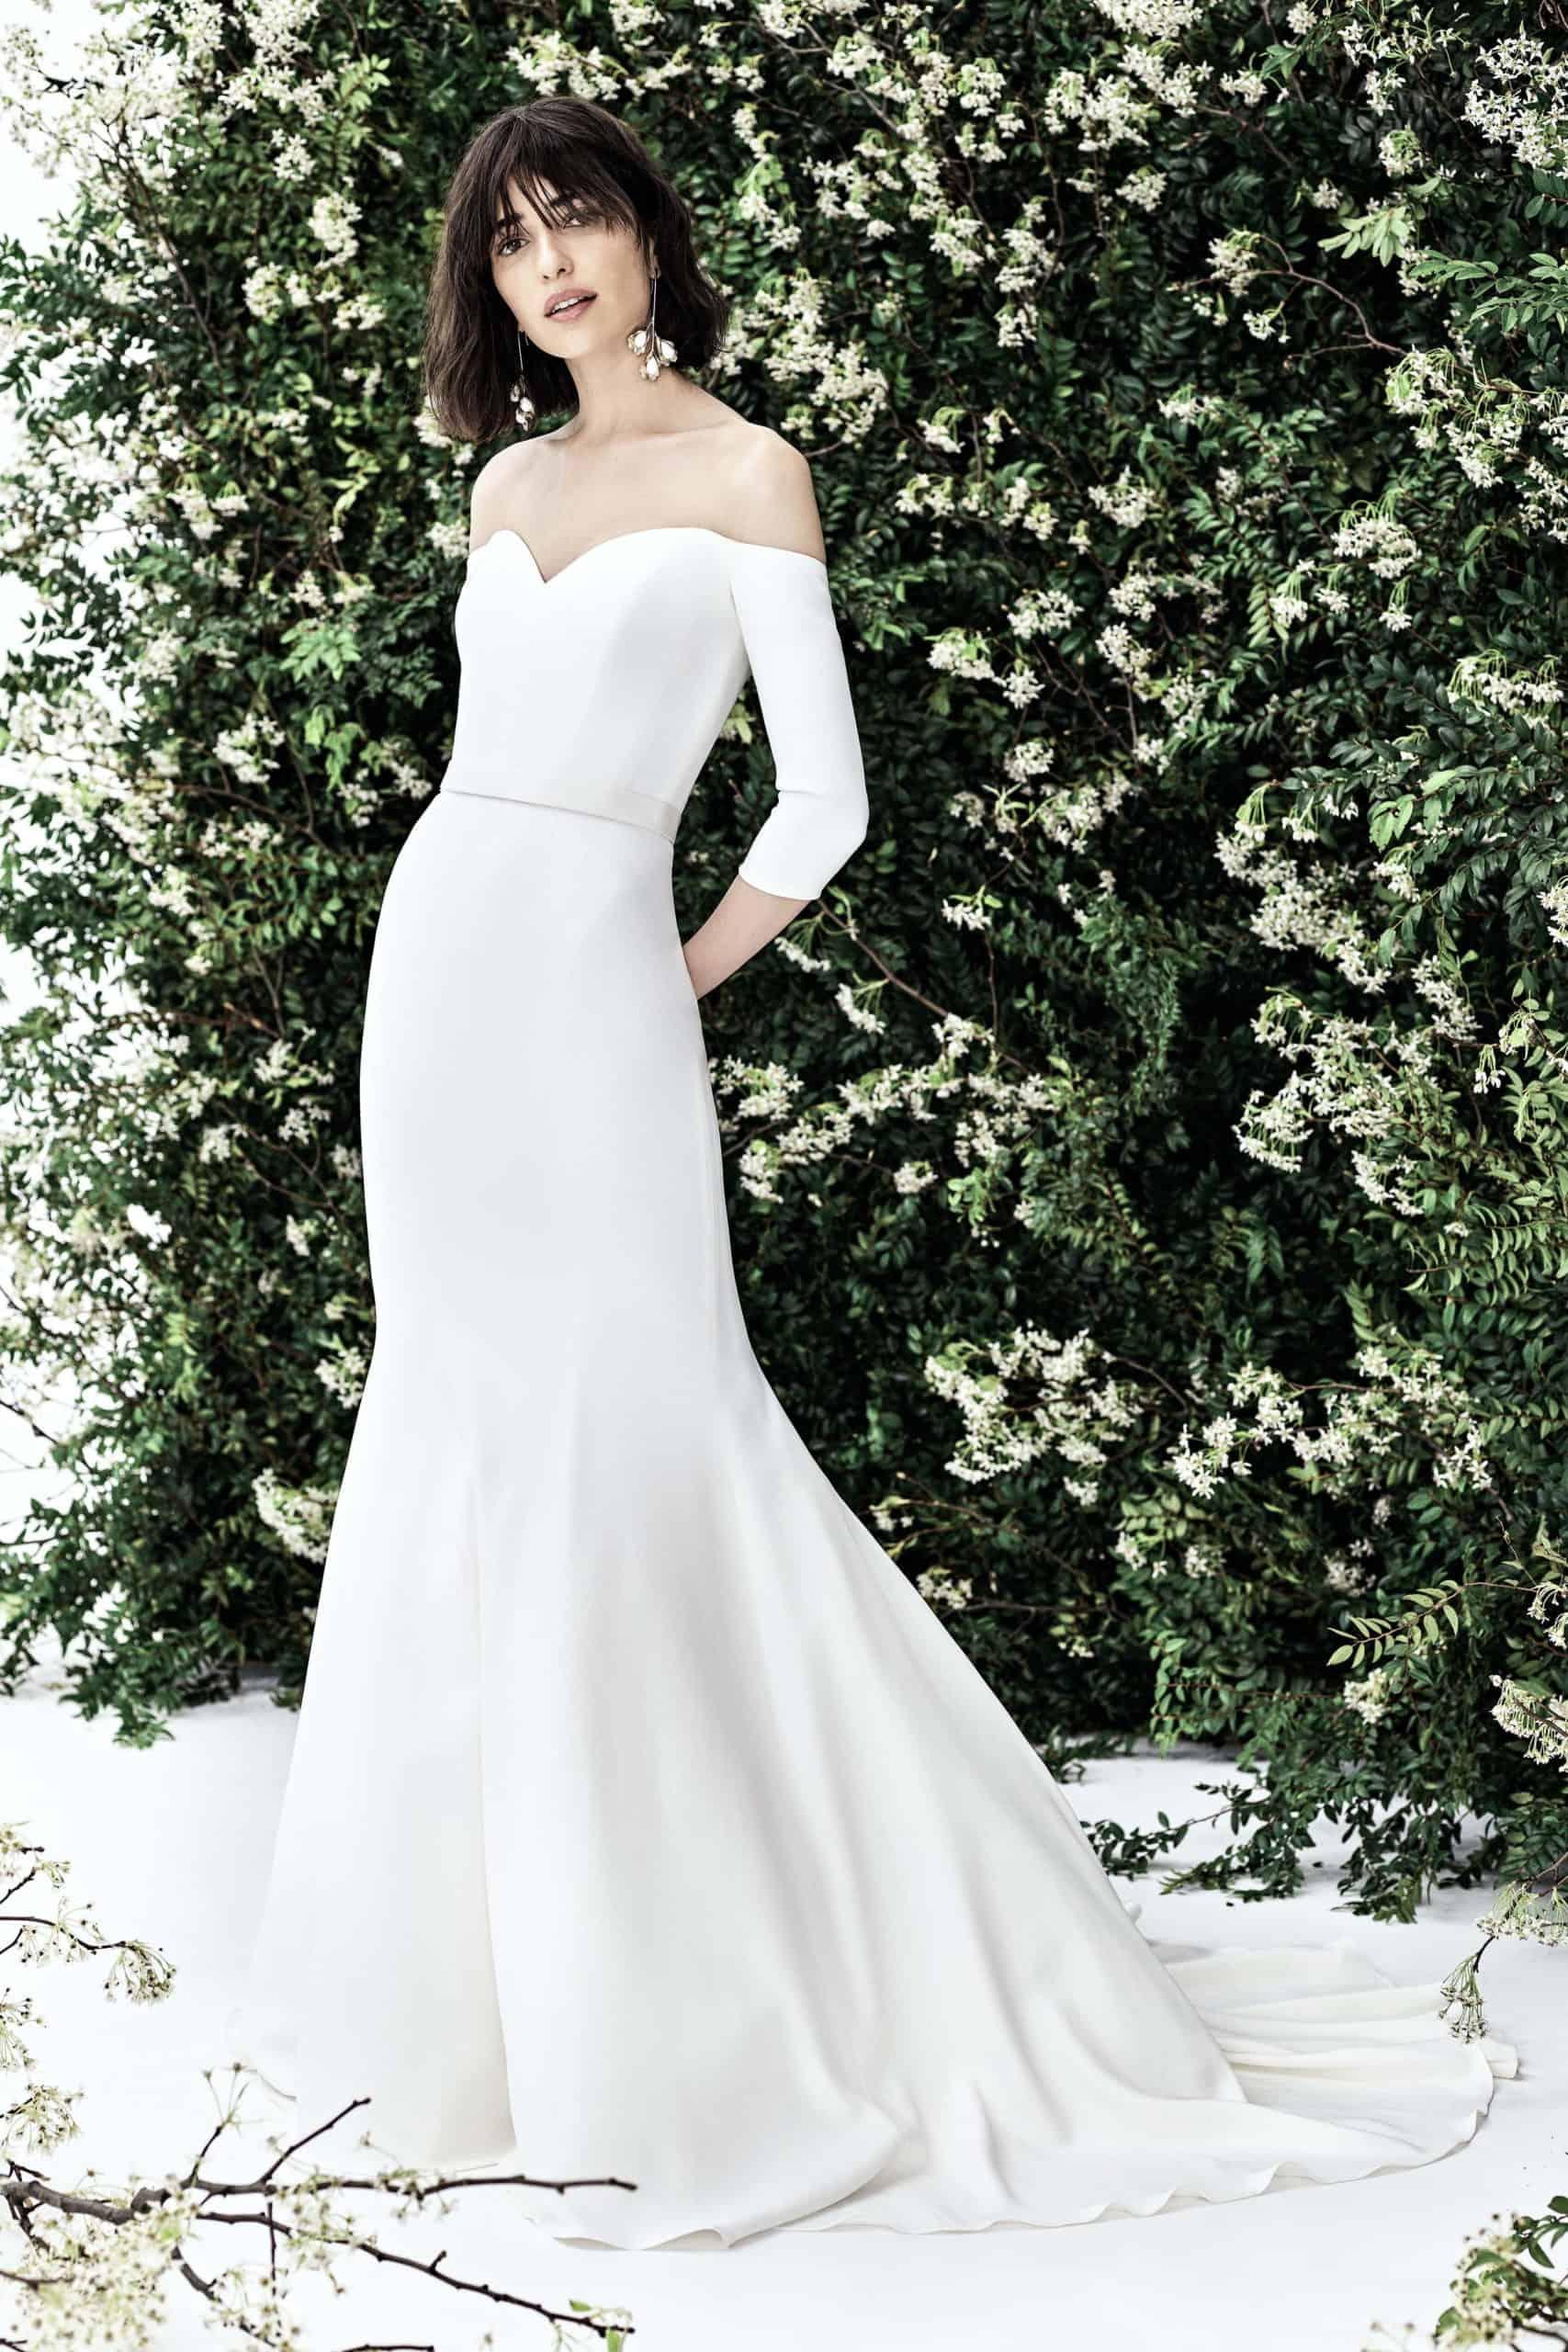 satin wedding dress with long sleeves by Carolina Herrera